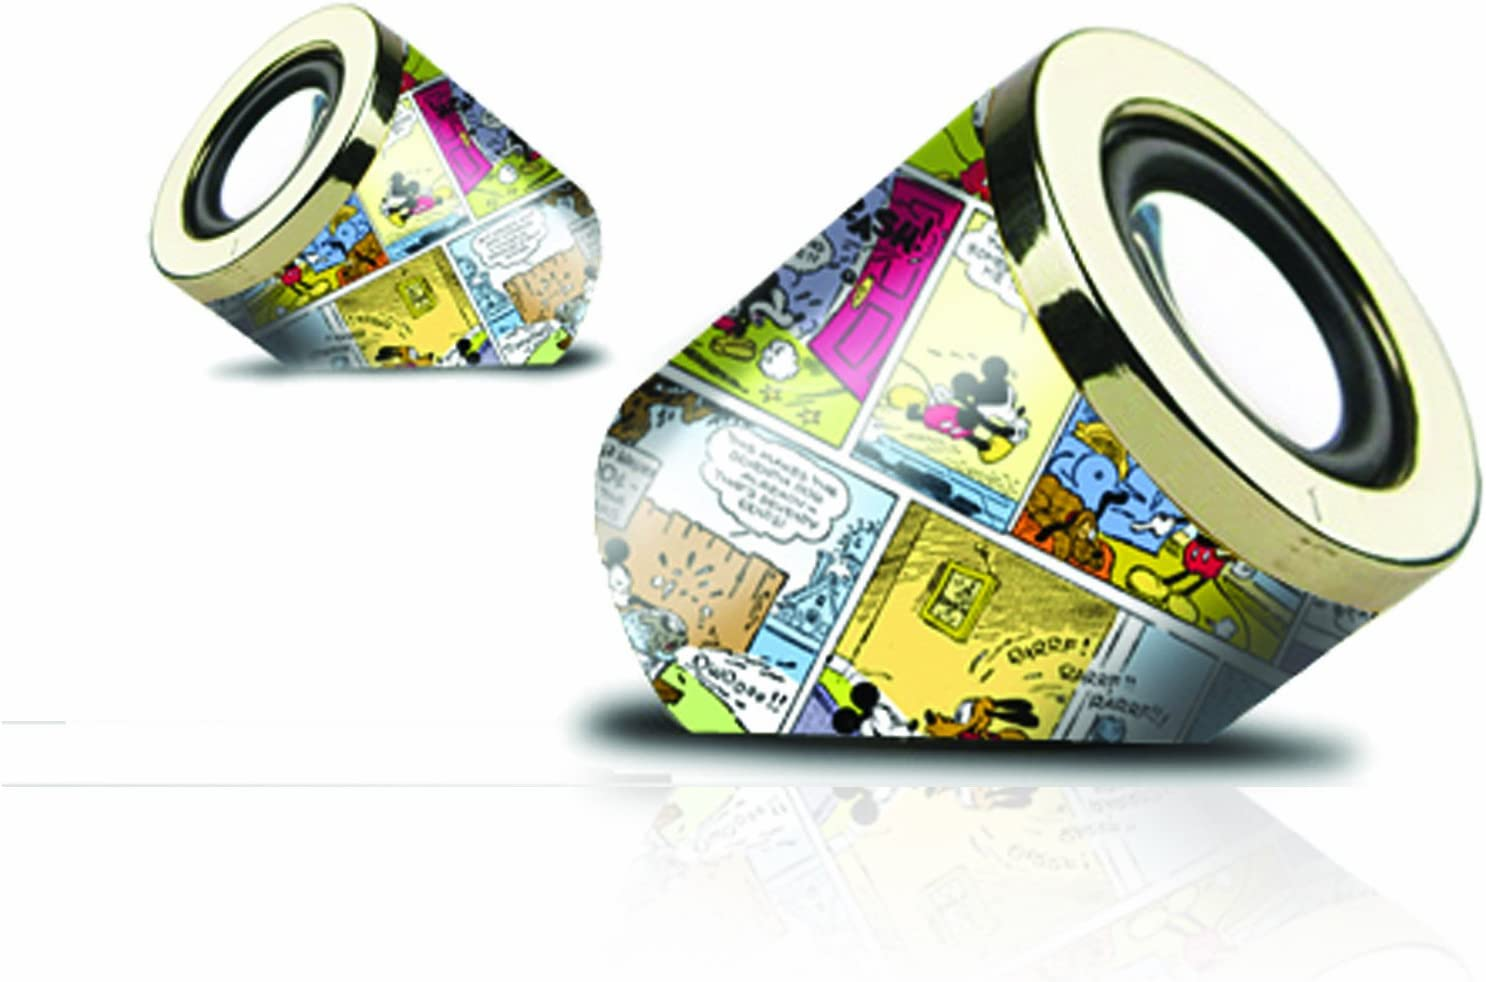 Disney Mickey Mouse 2.0 USB Speakers